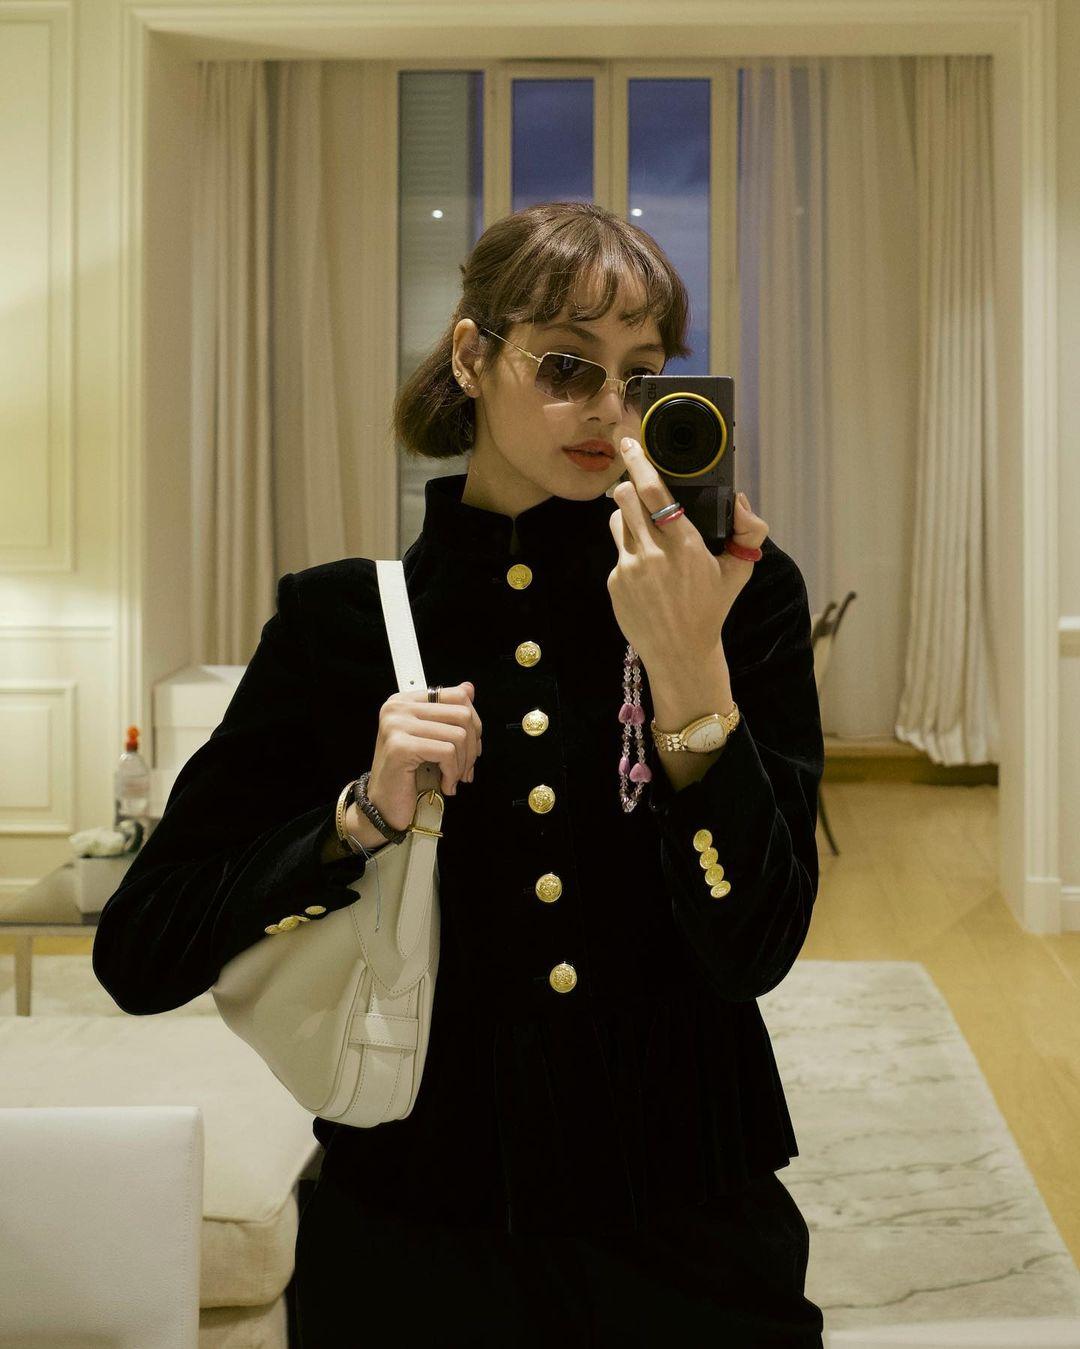 LISA - Blackpink - Nova selfie com glamour